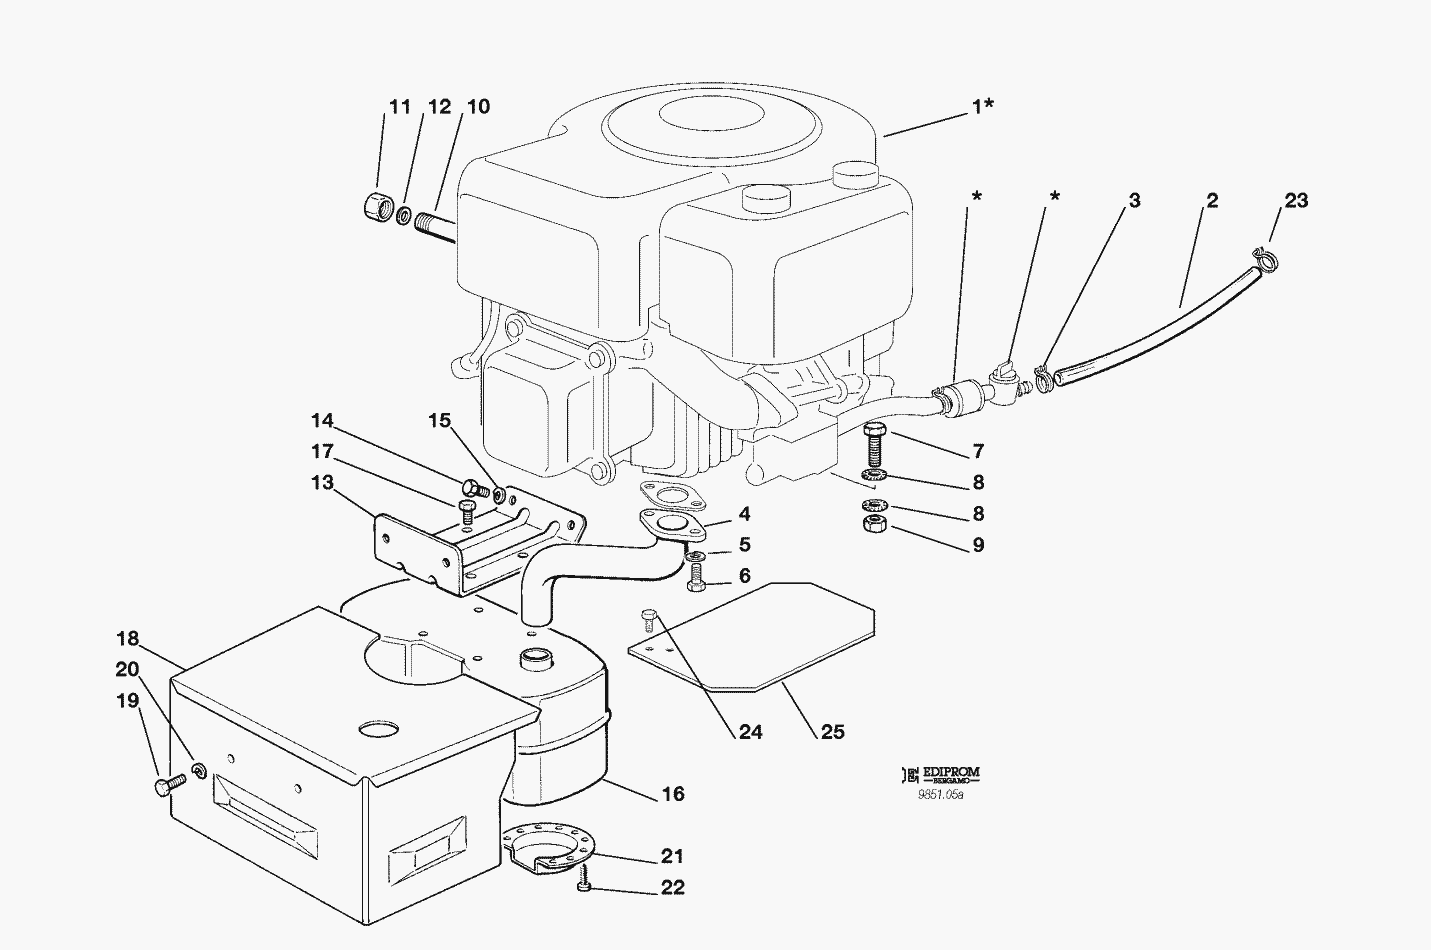 Craftsman Lawn Mower Engine Parts Diagram | Displanet.net